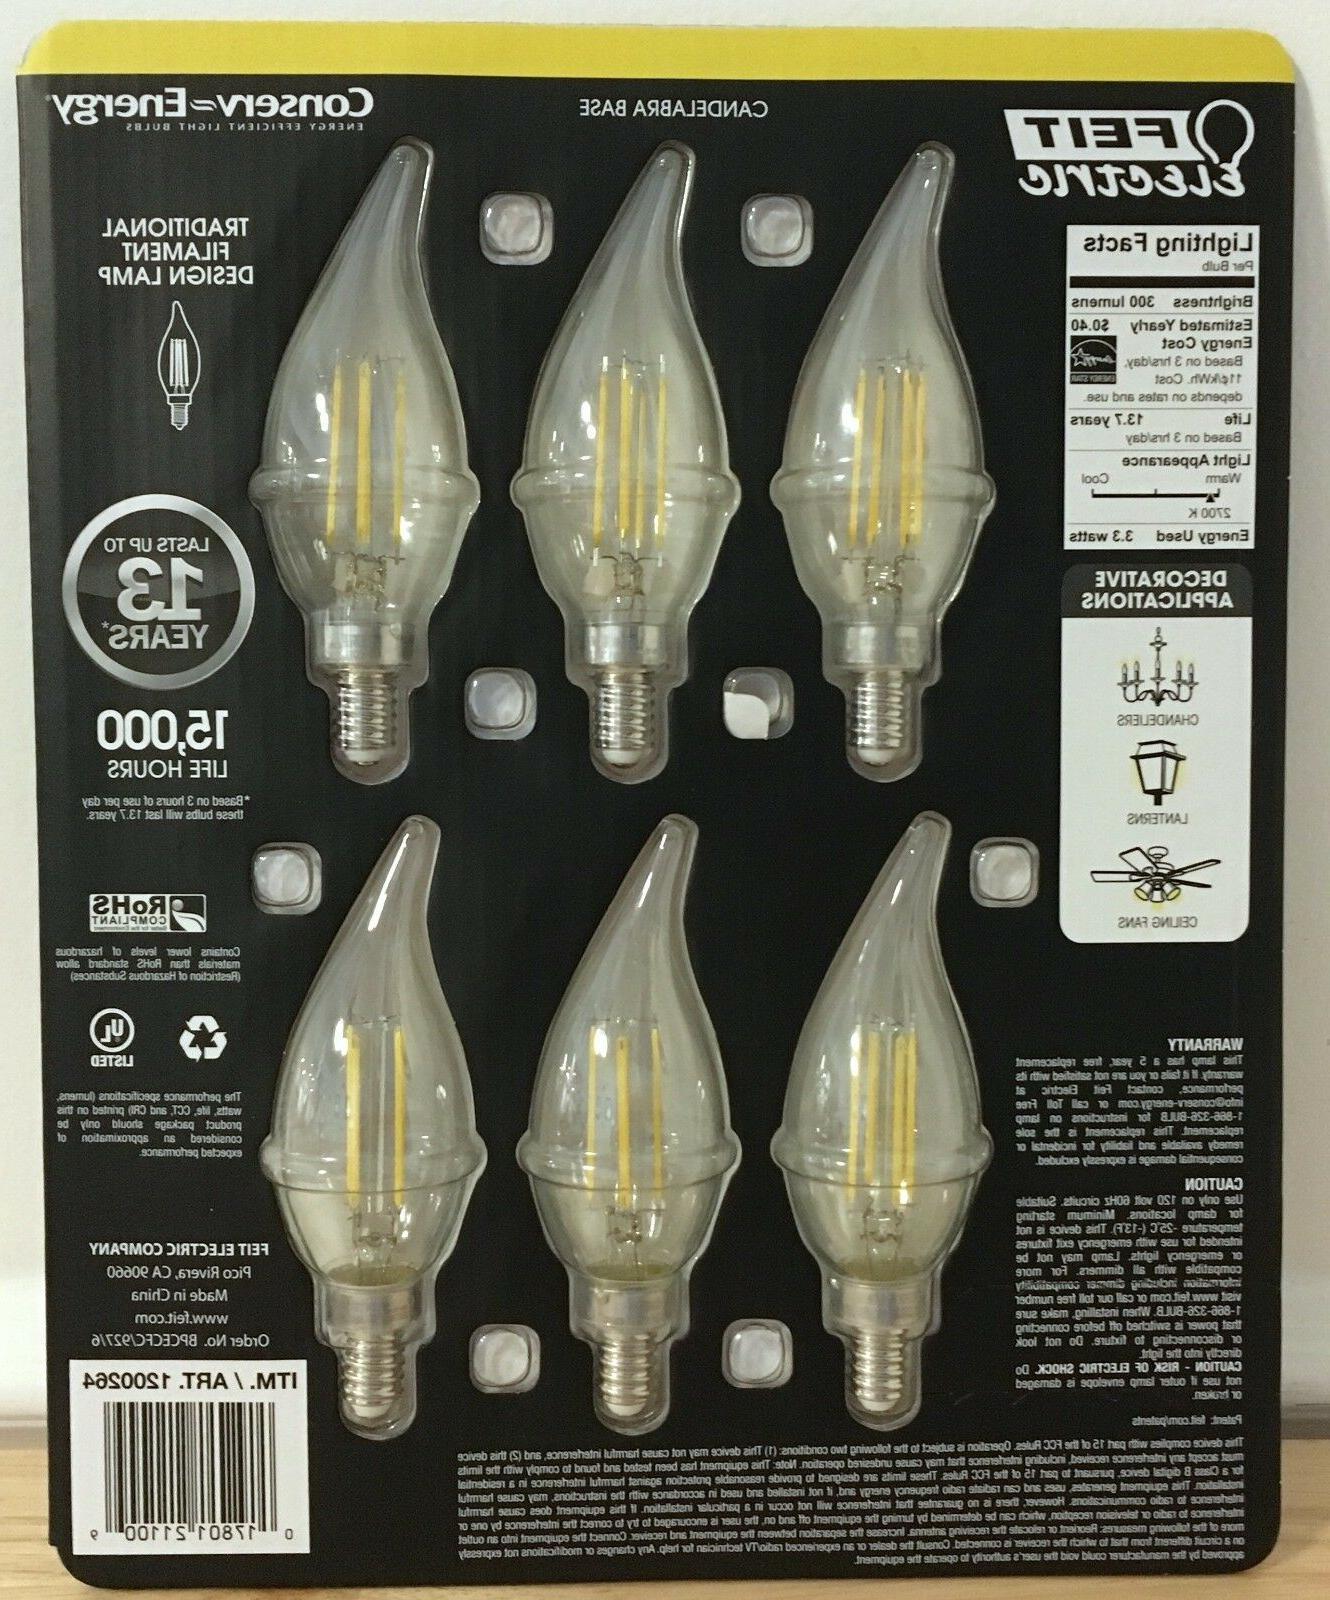 NEW E12 Soft Chandelier Bulbs 40w